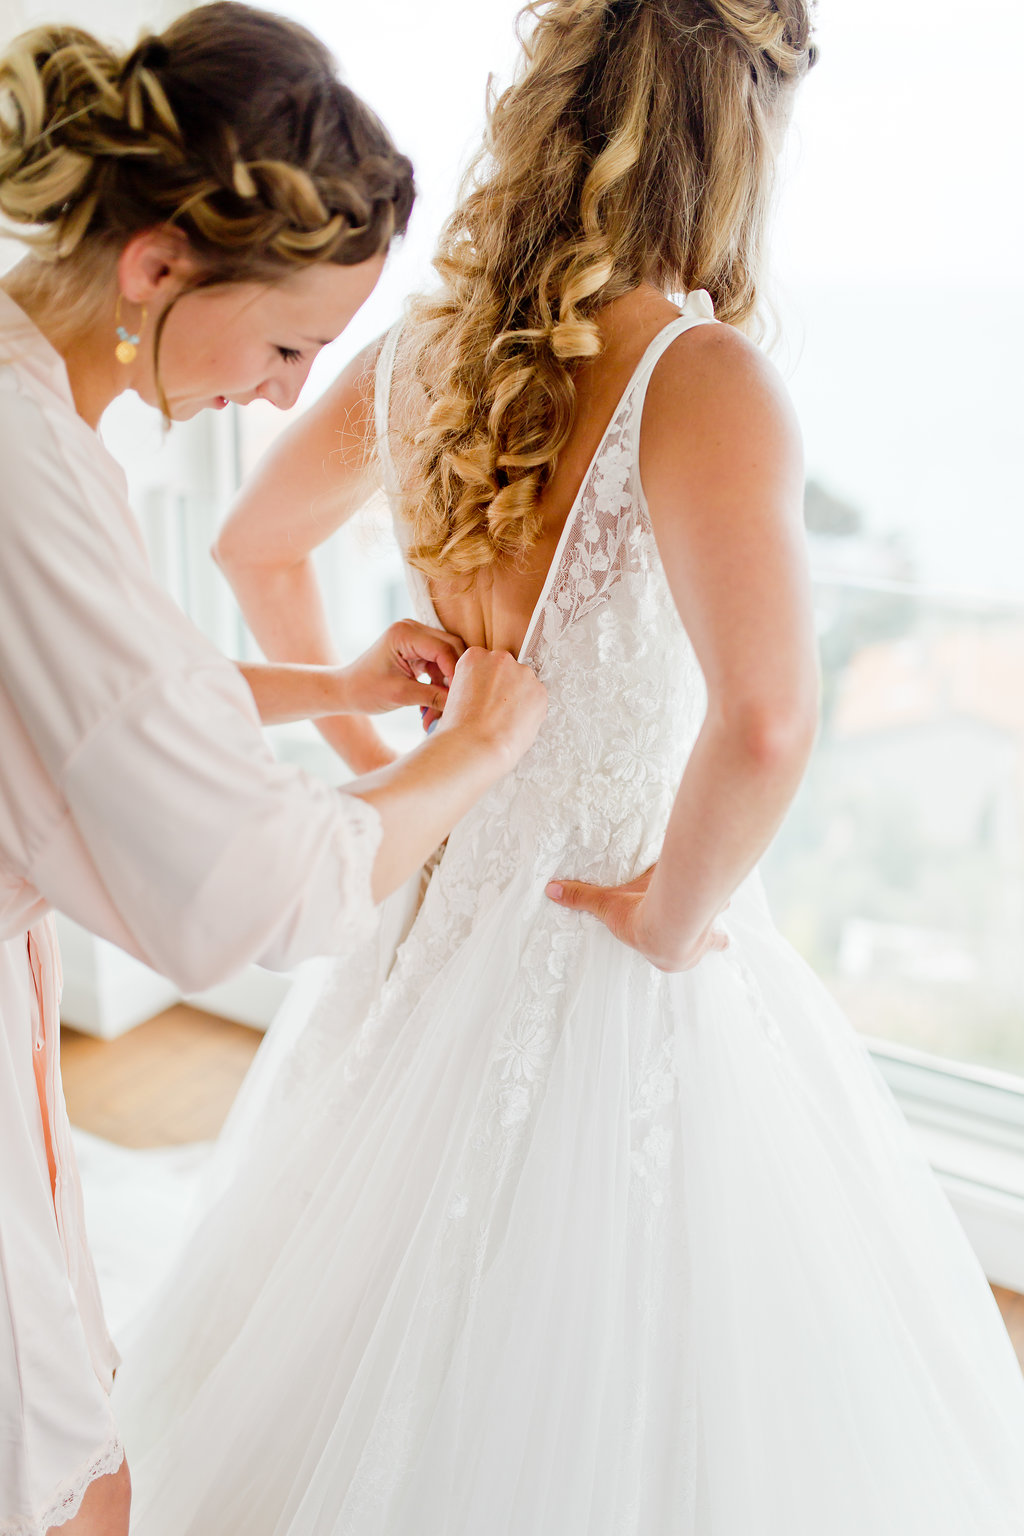 le coeur dans les etoiles - wedding planner - provence - sardaigne - shooting inspiration - mariage voilier - audrey carnoy - habillage mariee 1